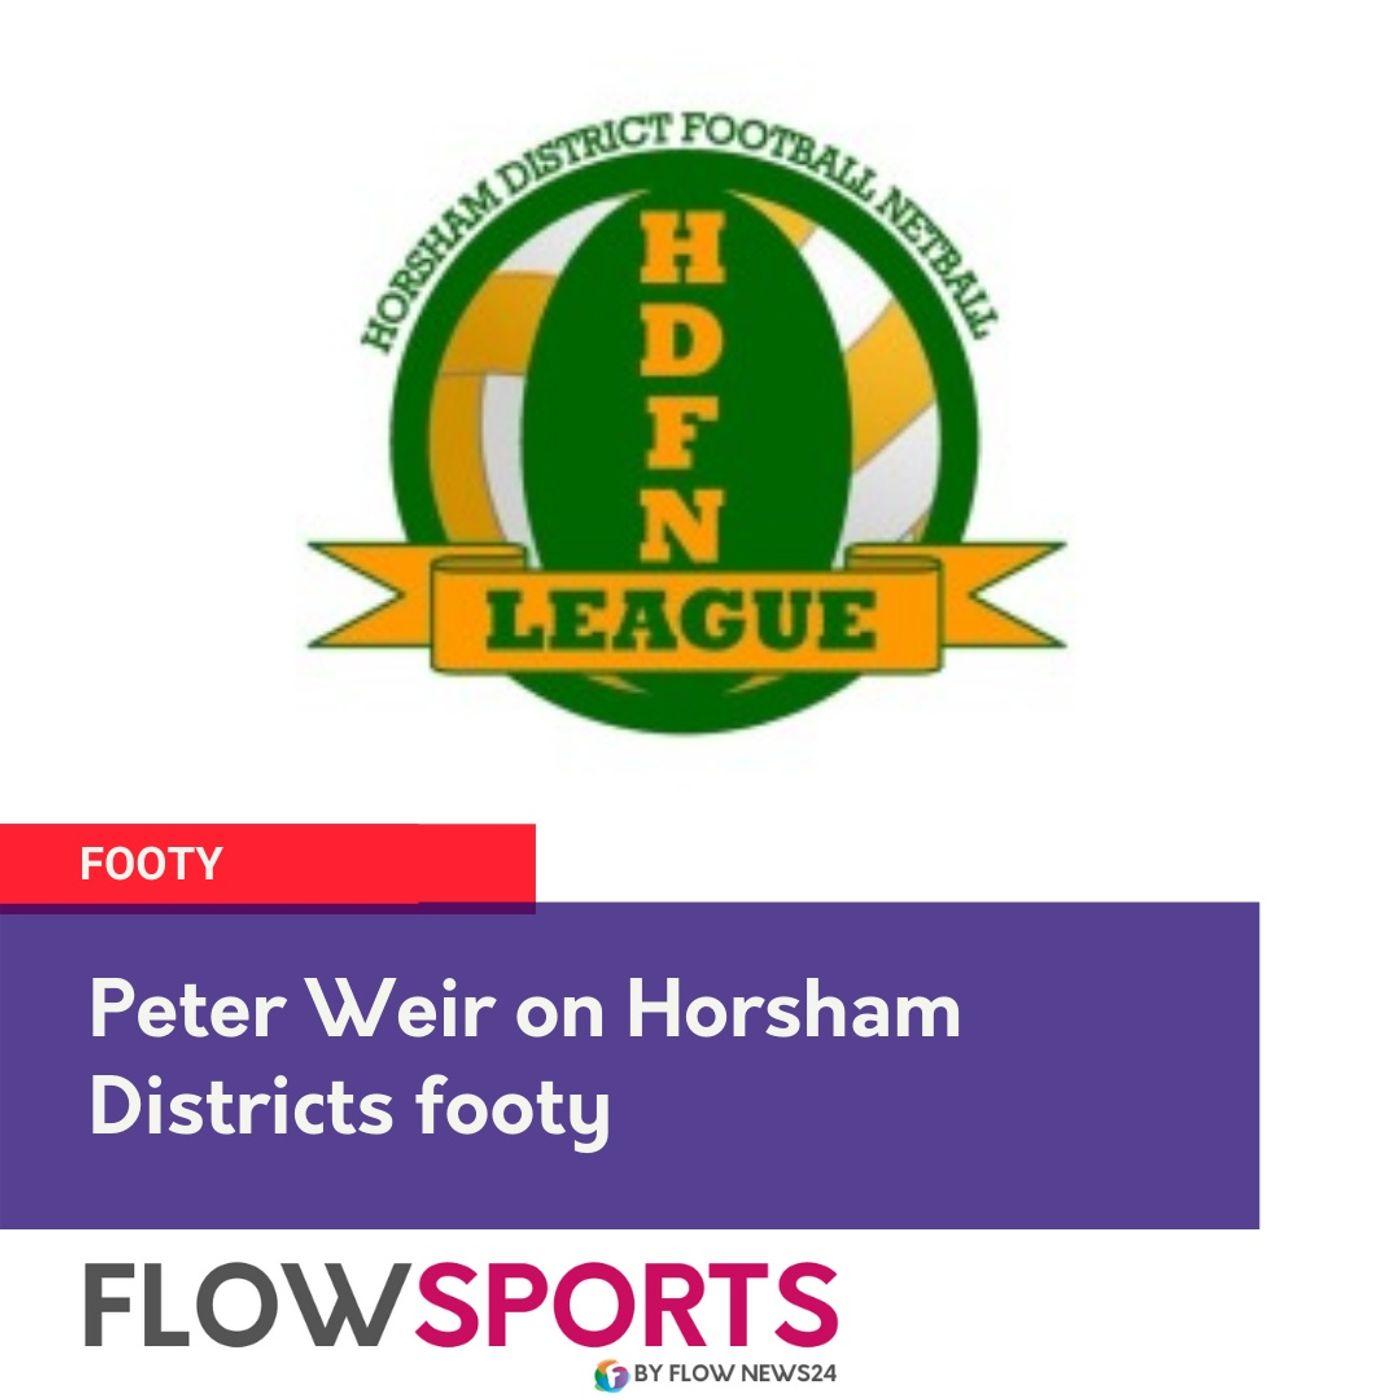 Peter Weir reviews Reserves, U17 and U14 from Horsham District Football League